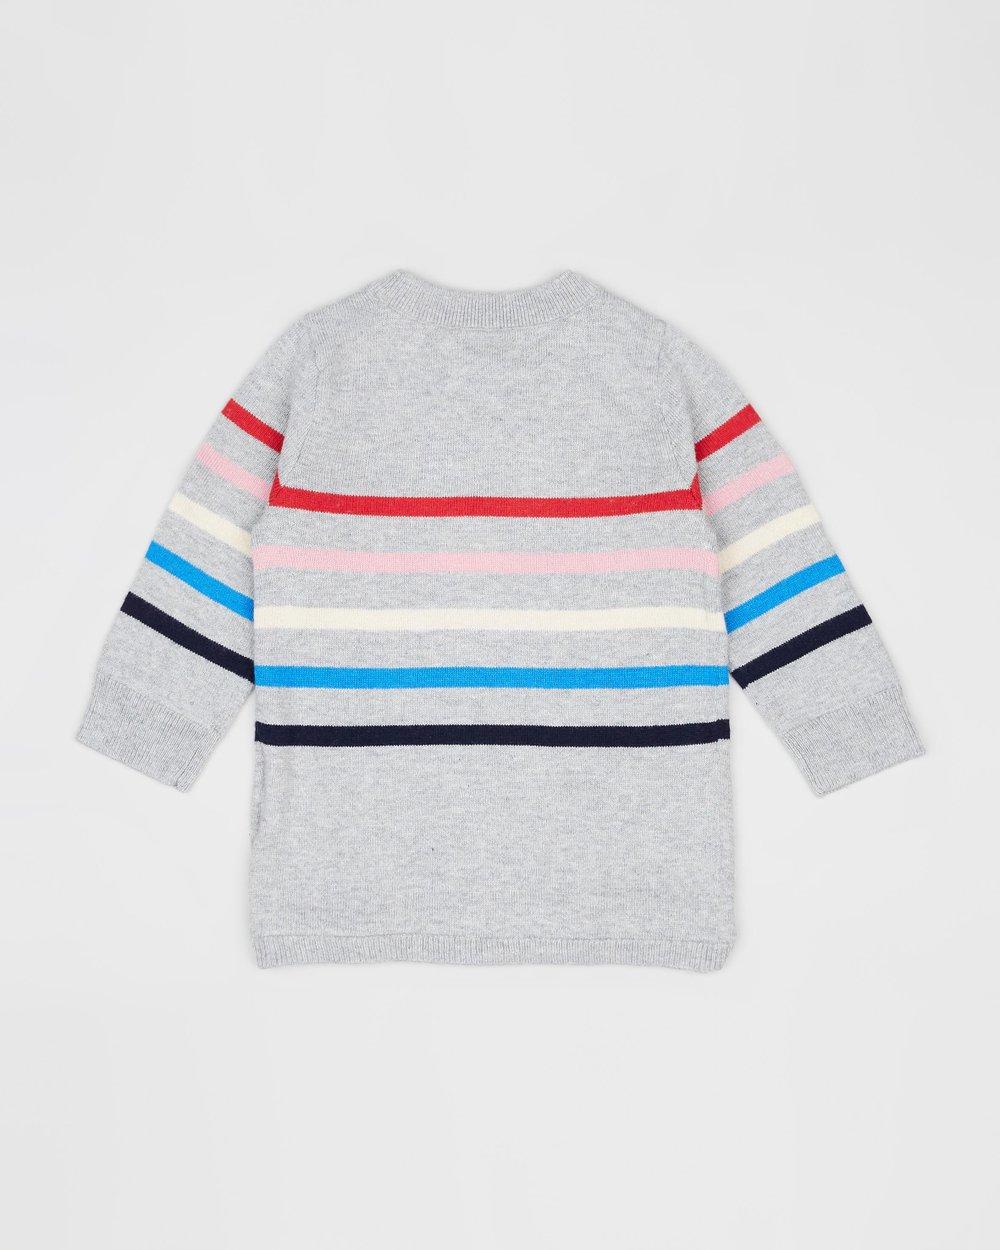 4014cea80 Disney Minnie Mouse Sweater - Babies-Kids by babyGap Online